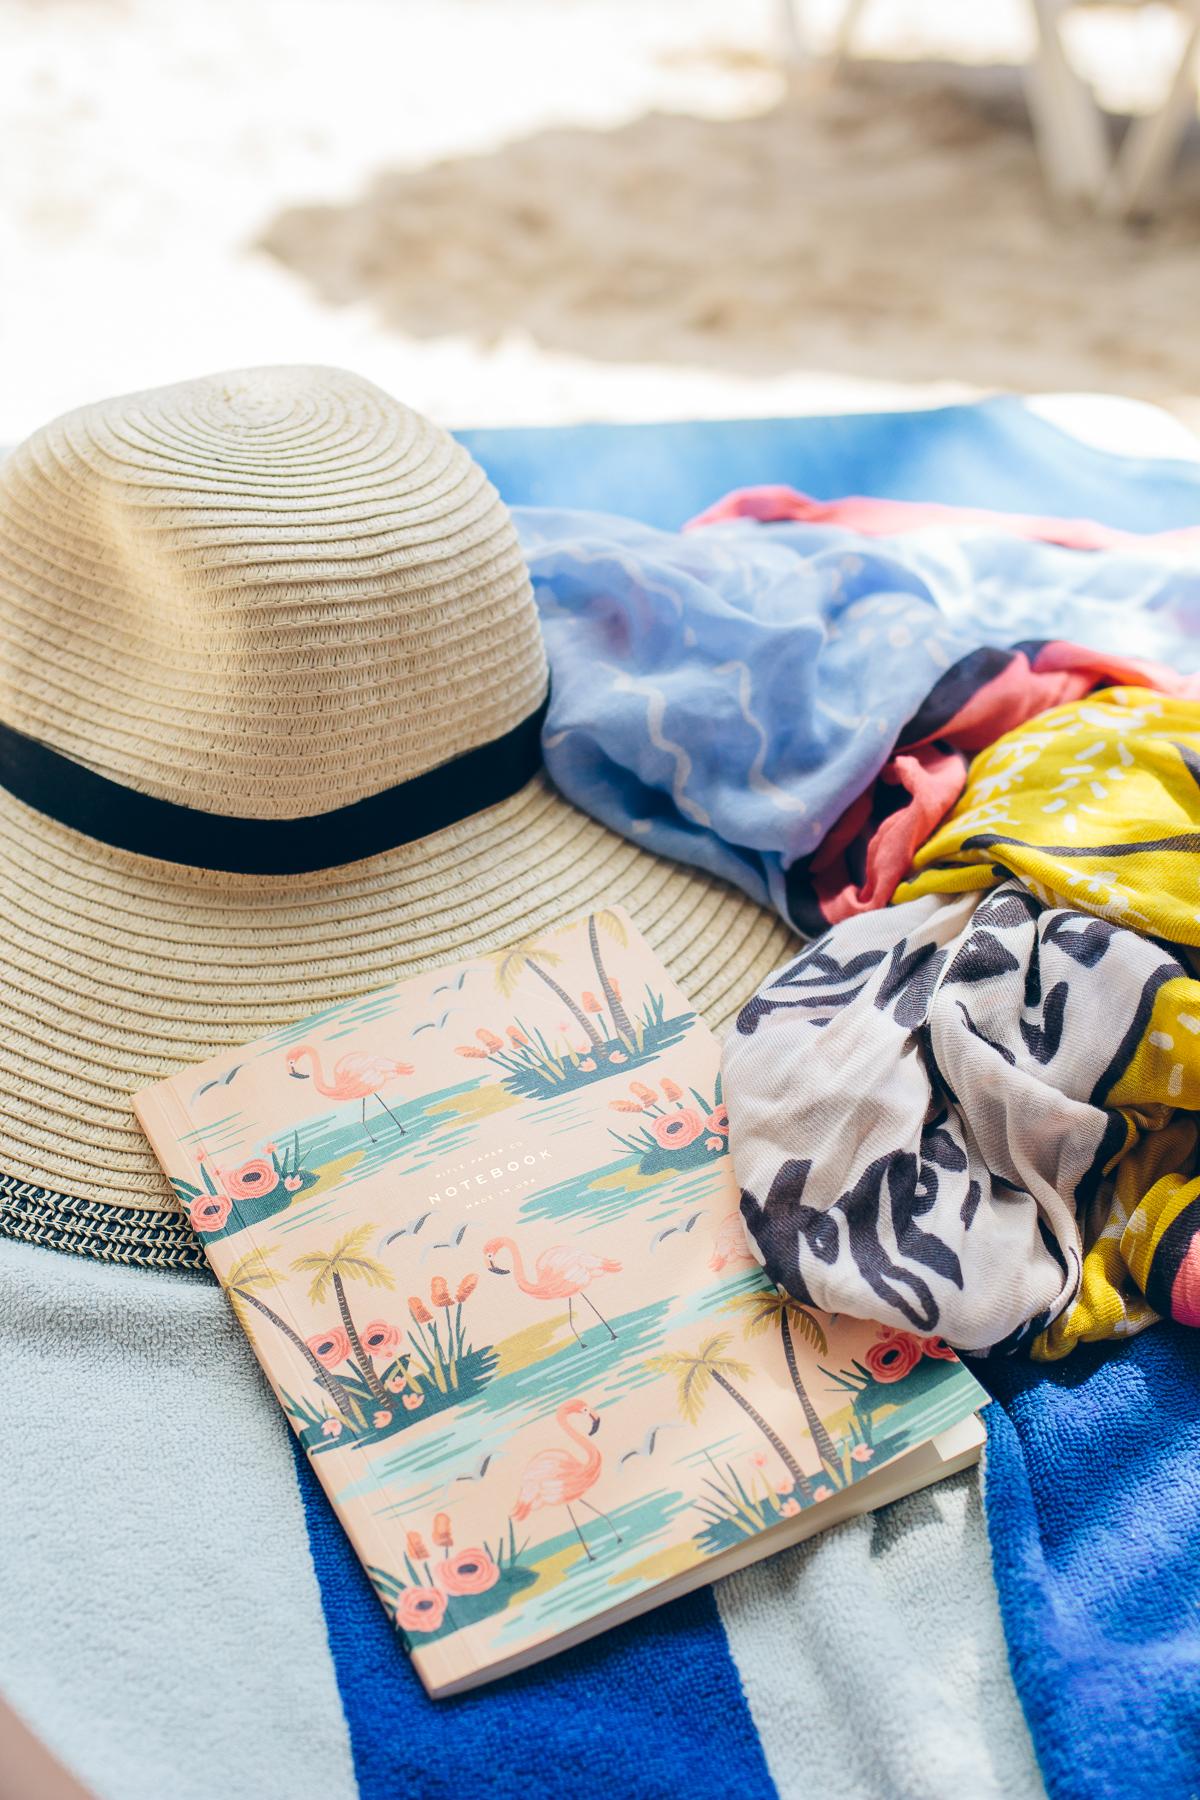 LOFT floppy hat, LOFT scarf, Rifle Paper Co journal —via @TheFoxandShe